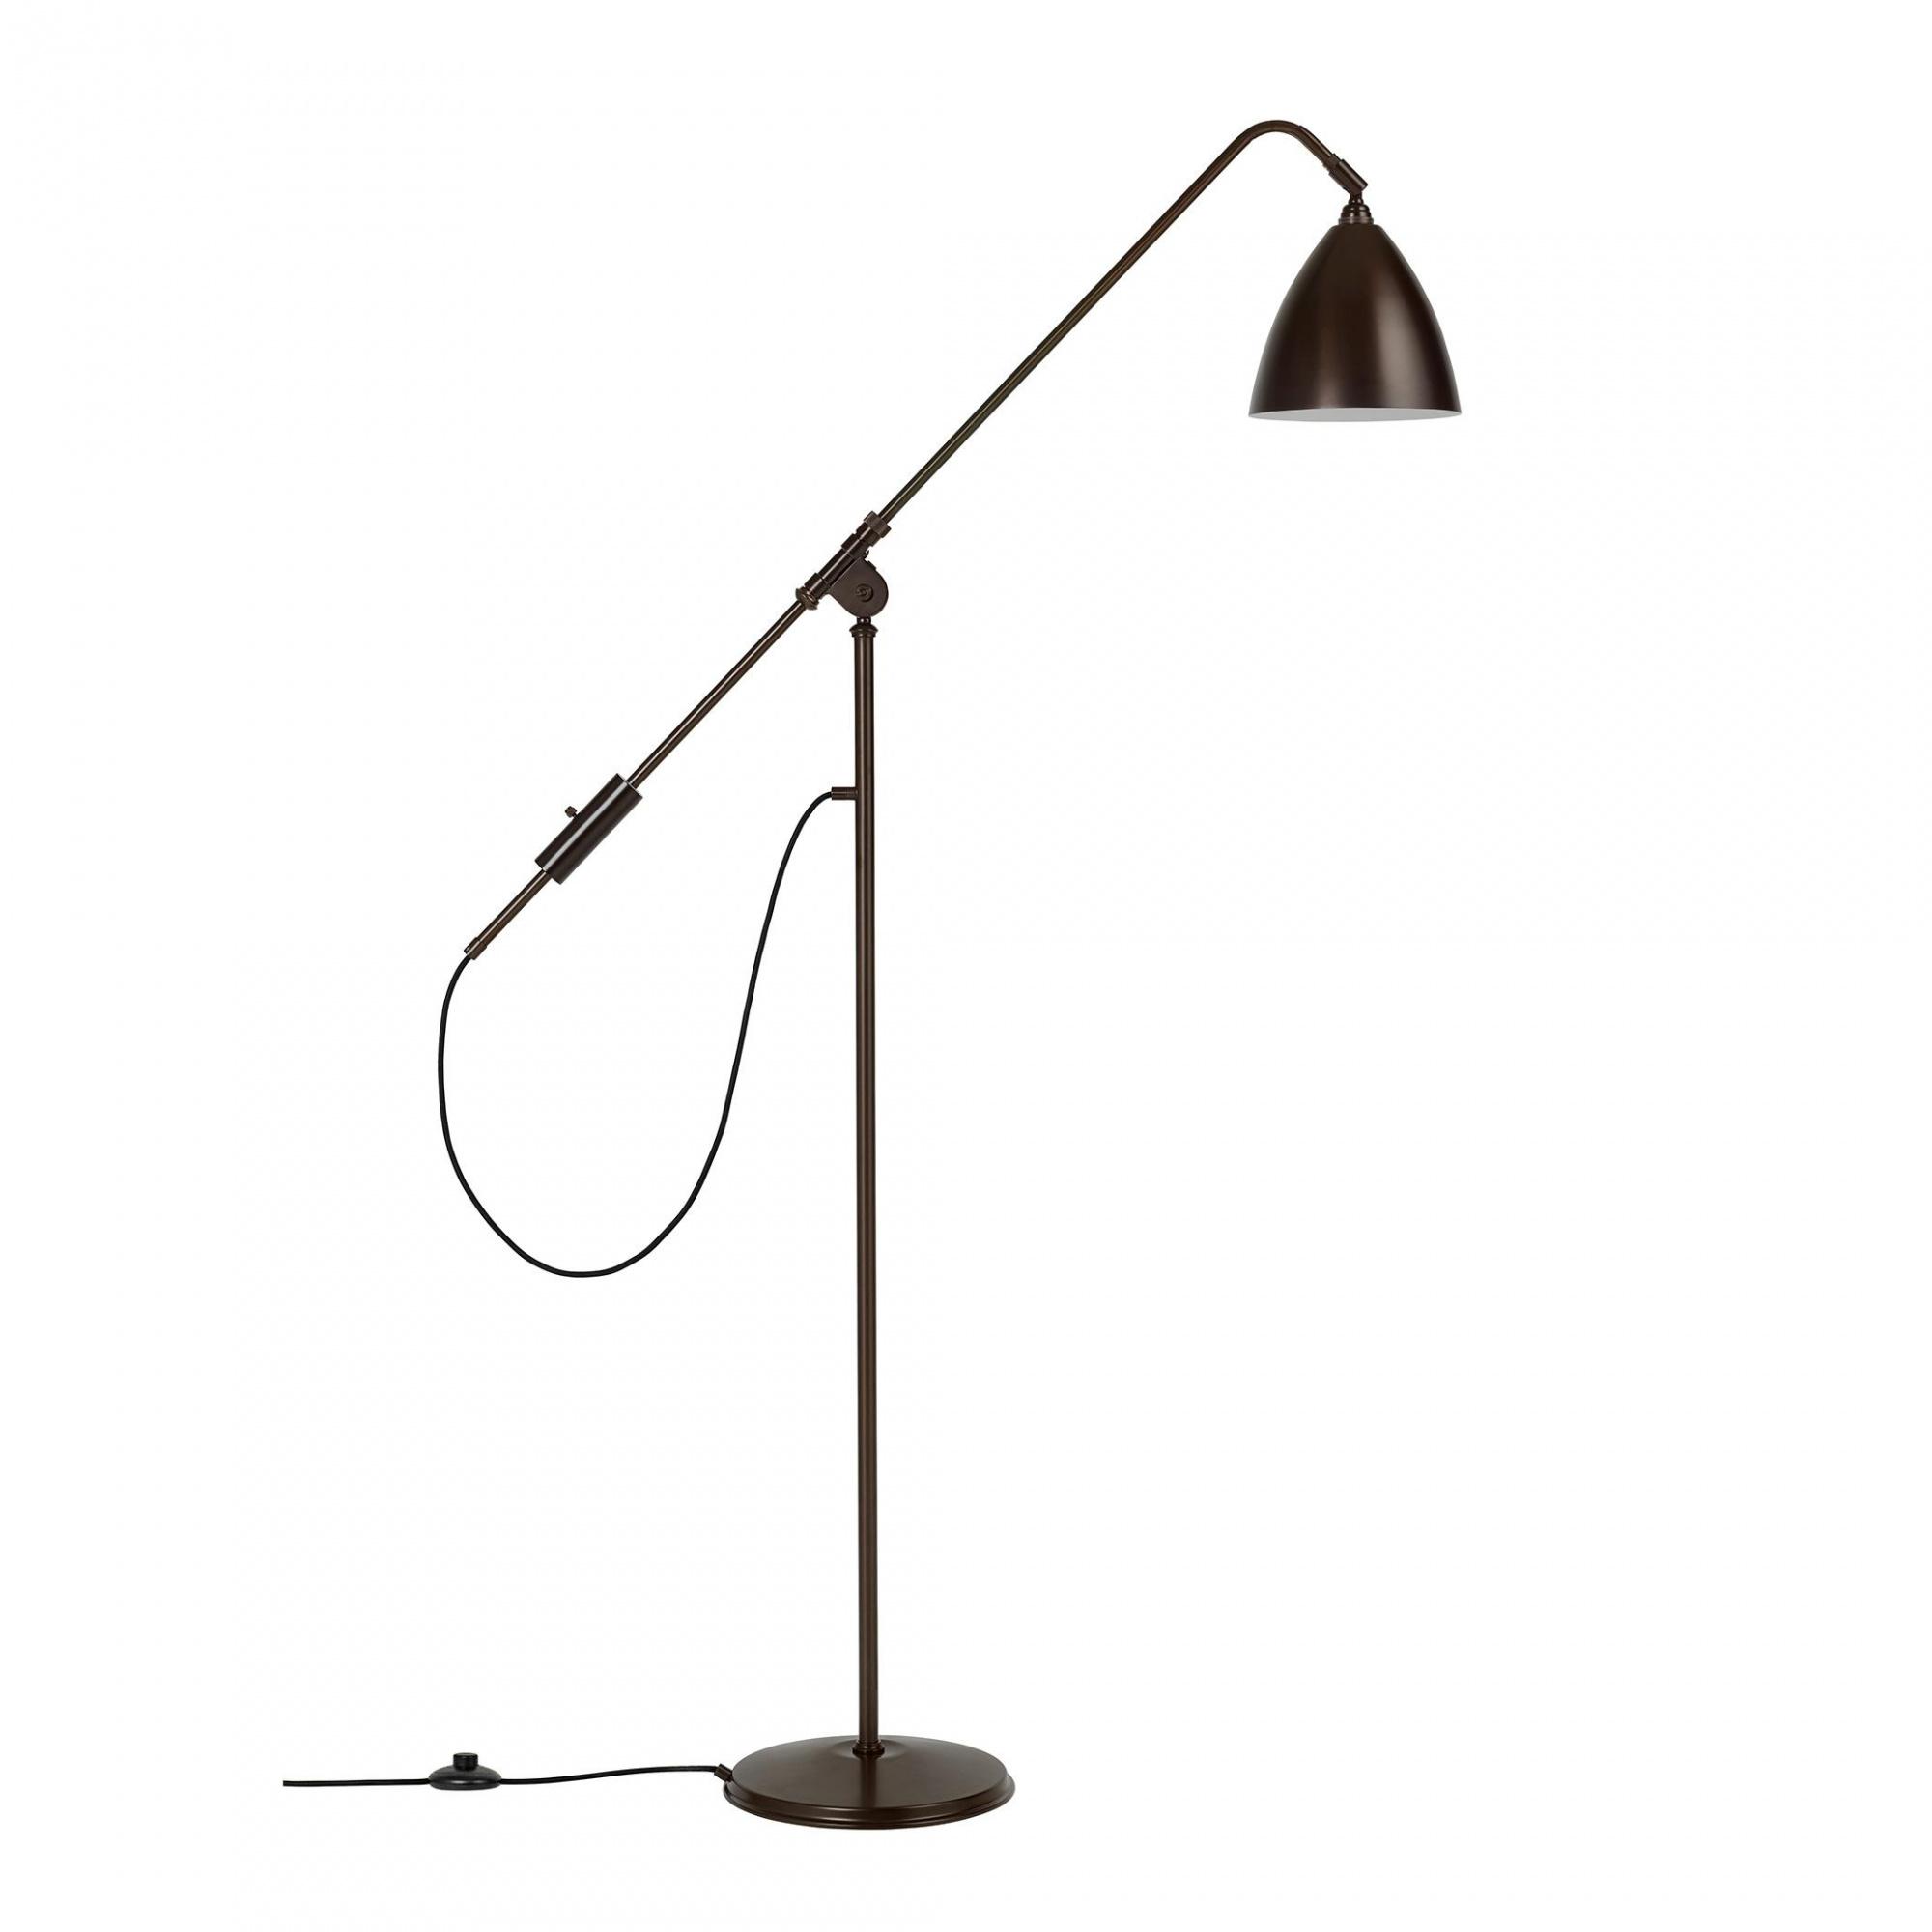 Stehlampe messing 210 cm PAROO